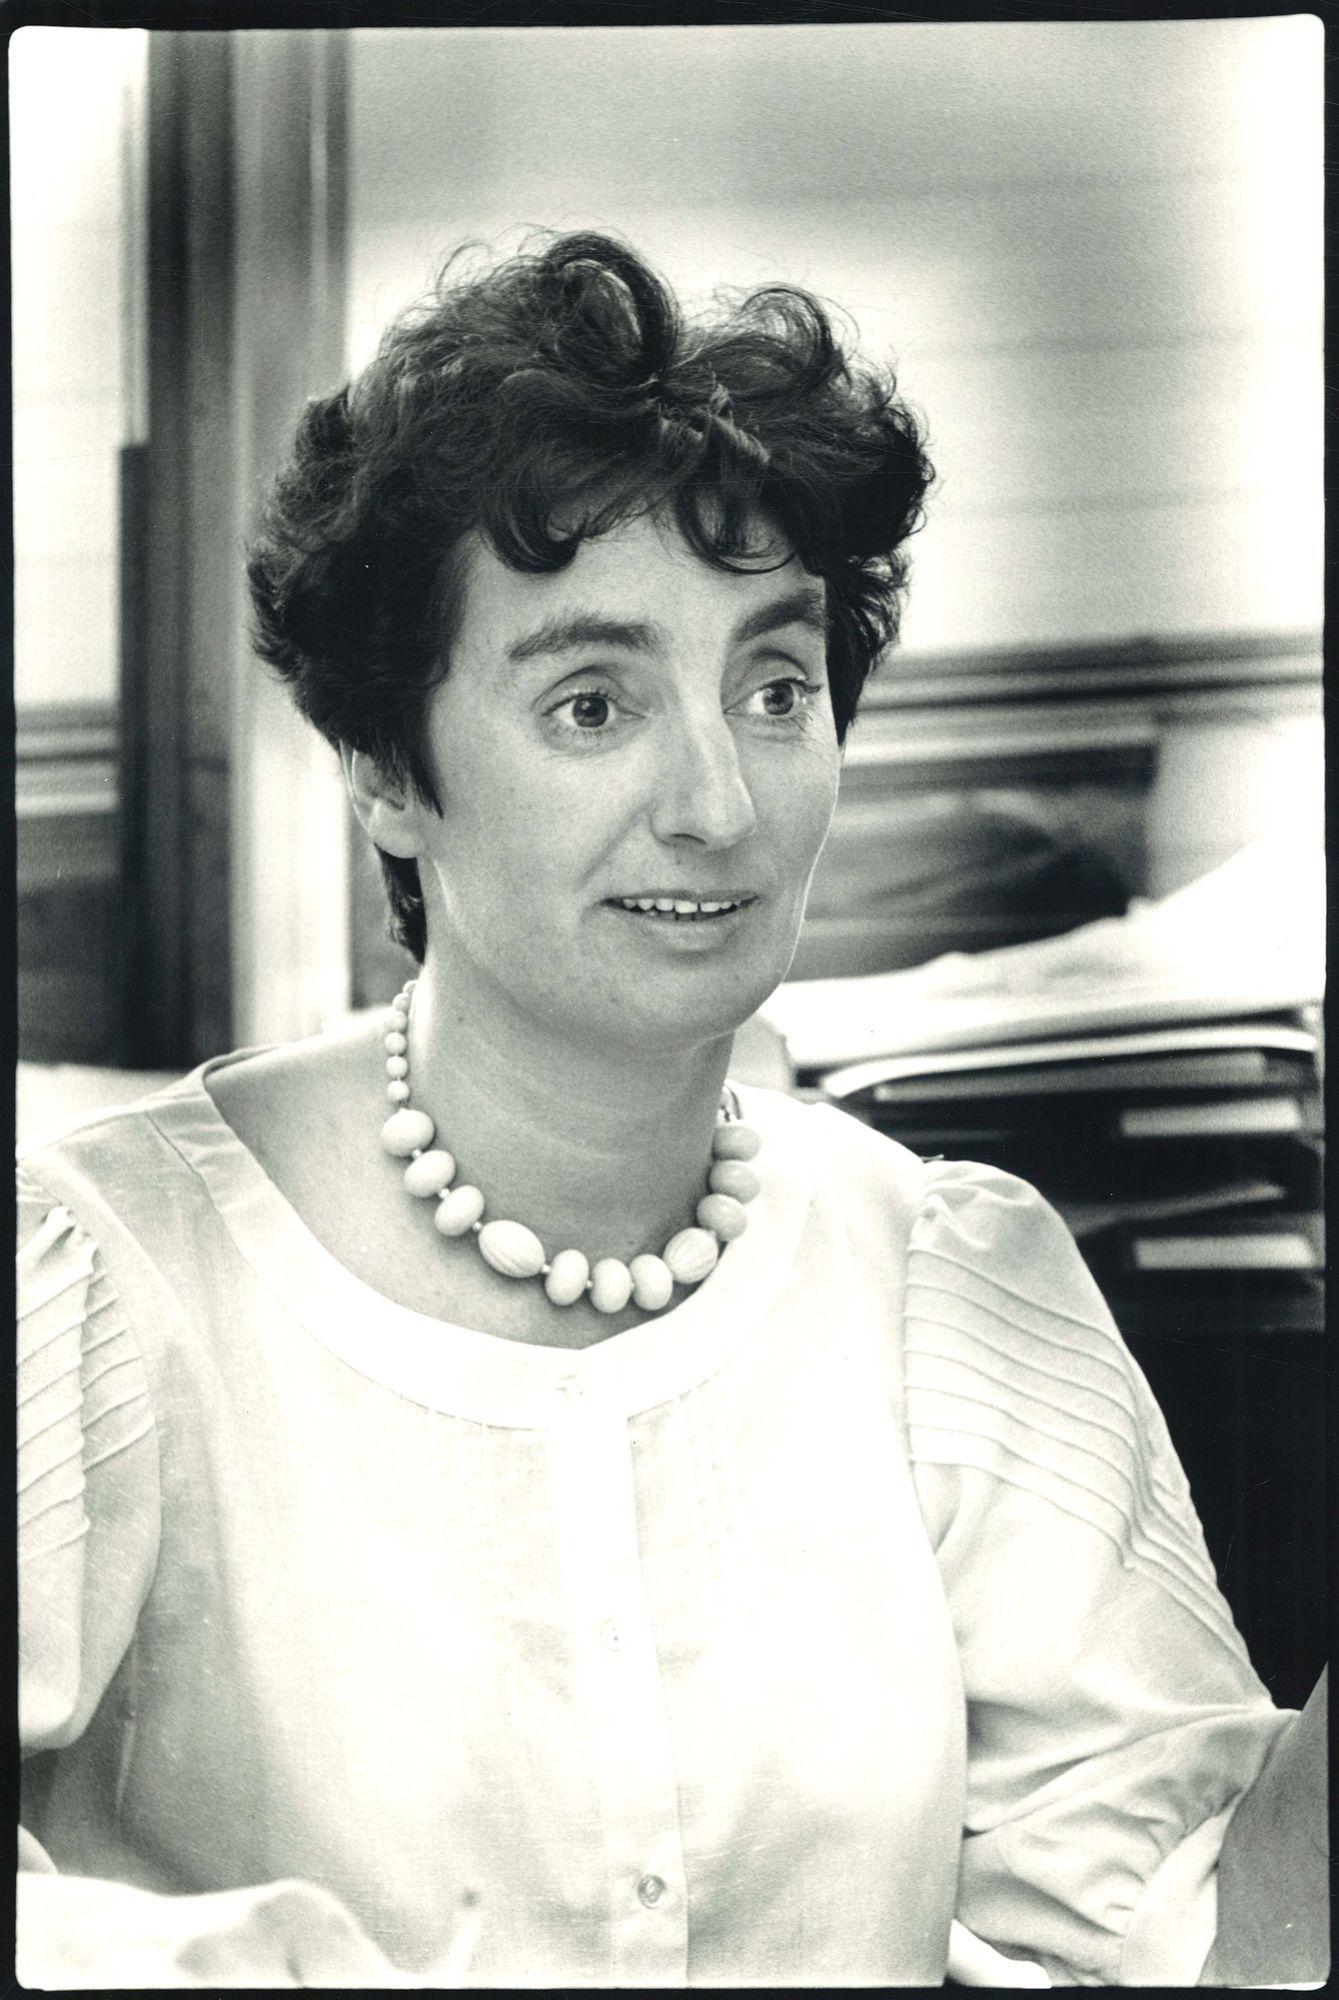 Vrouwen in een mannenwereld: Standenbedrijf Konstrukt-Al 1987